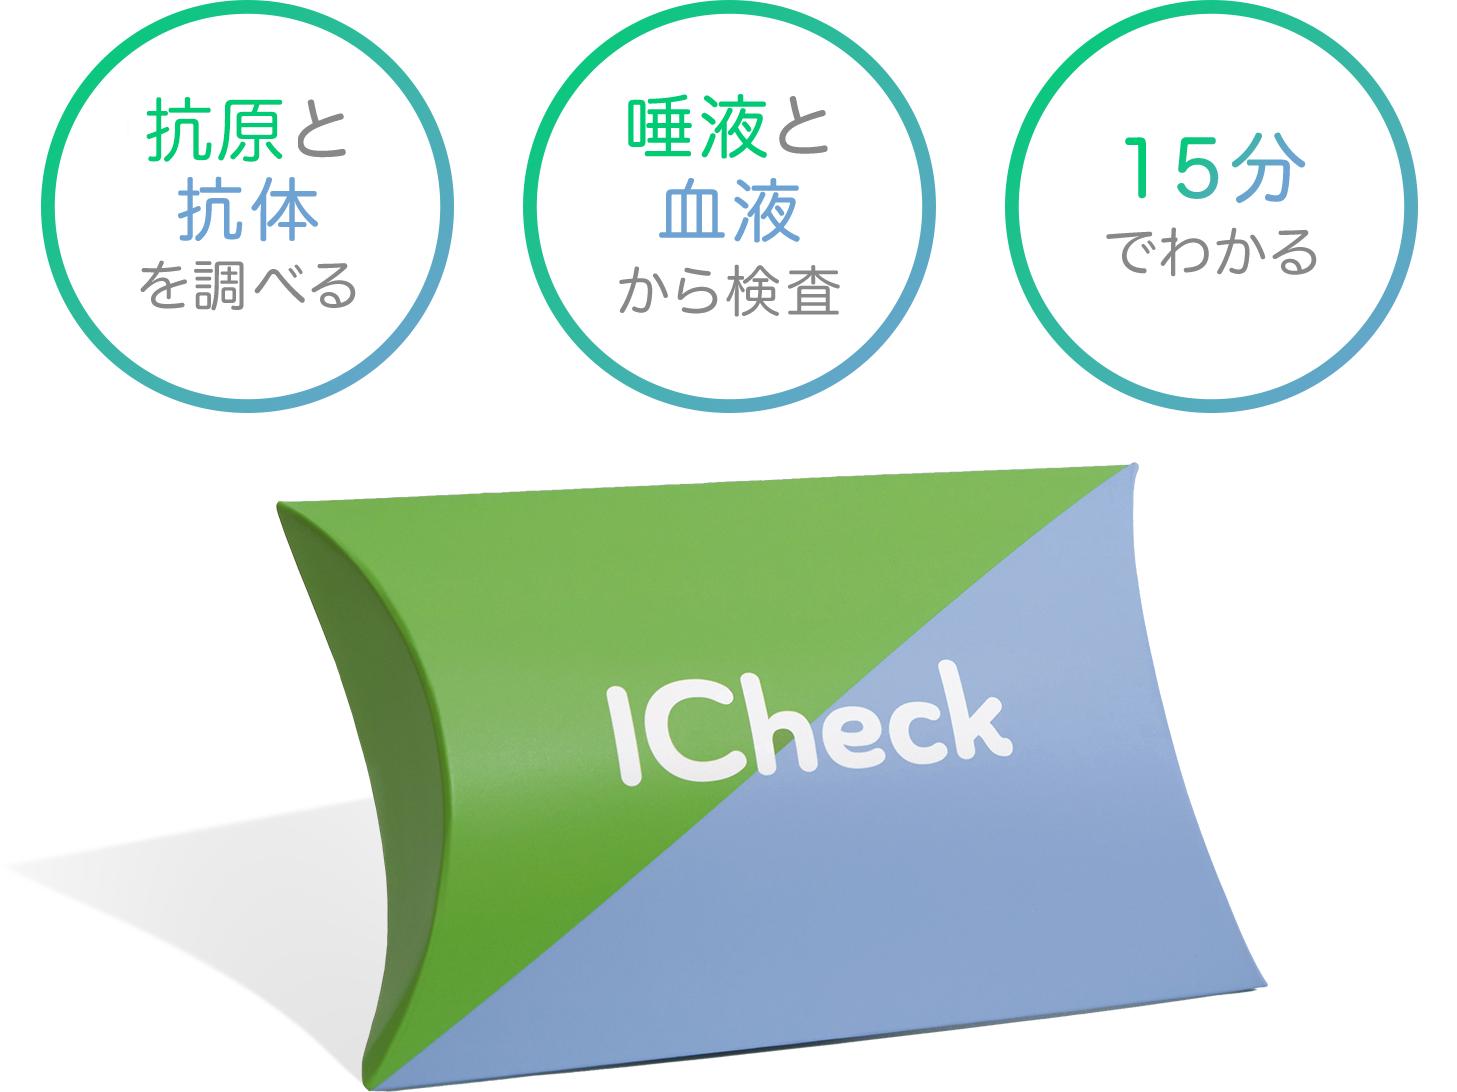 ICheck抗原検査&抗体検査パック5,980円